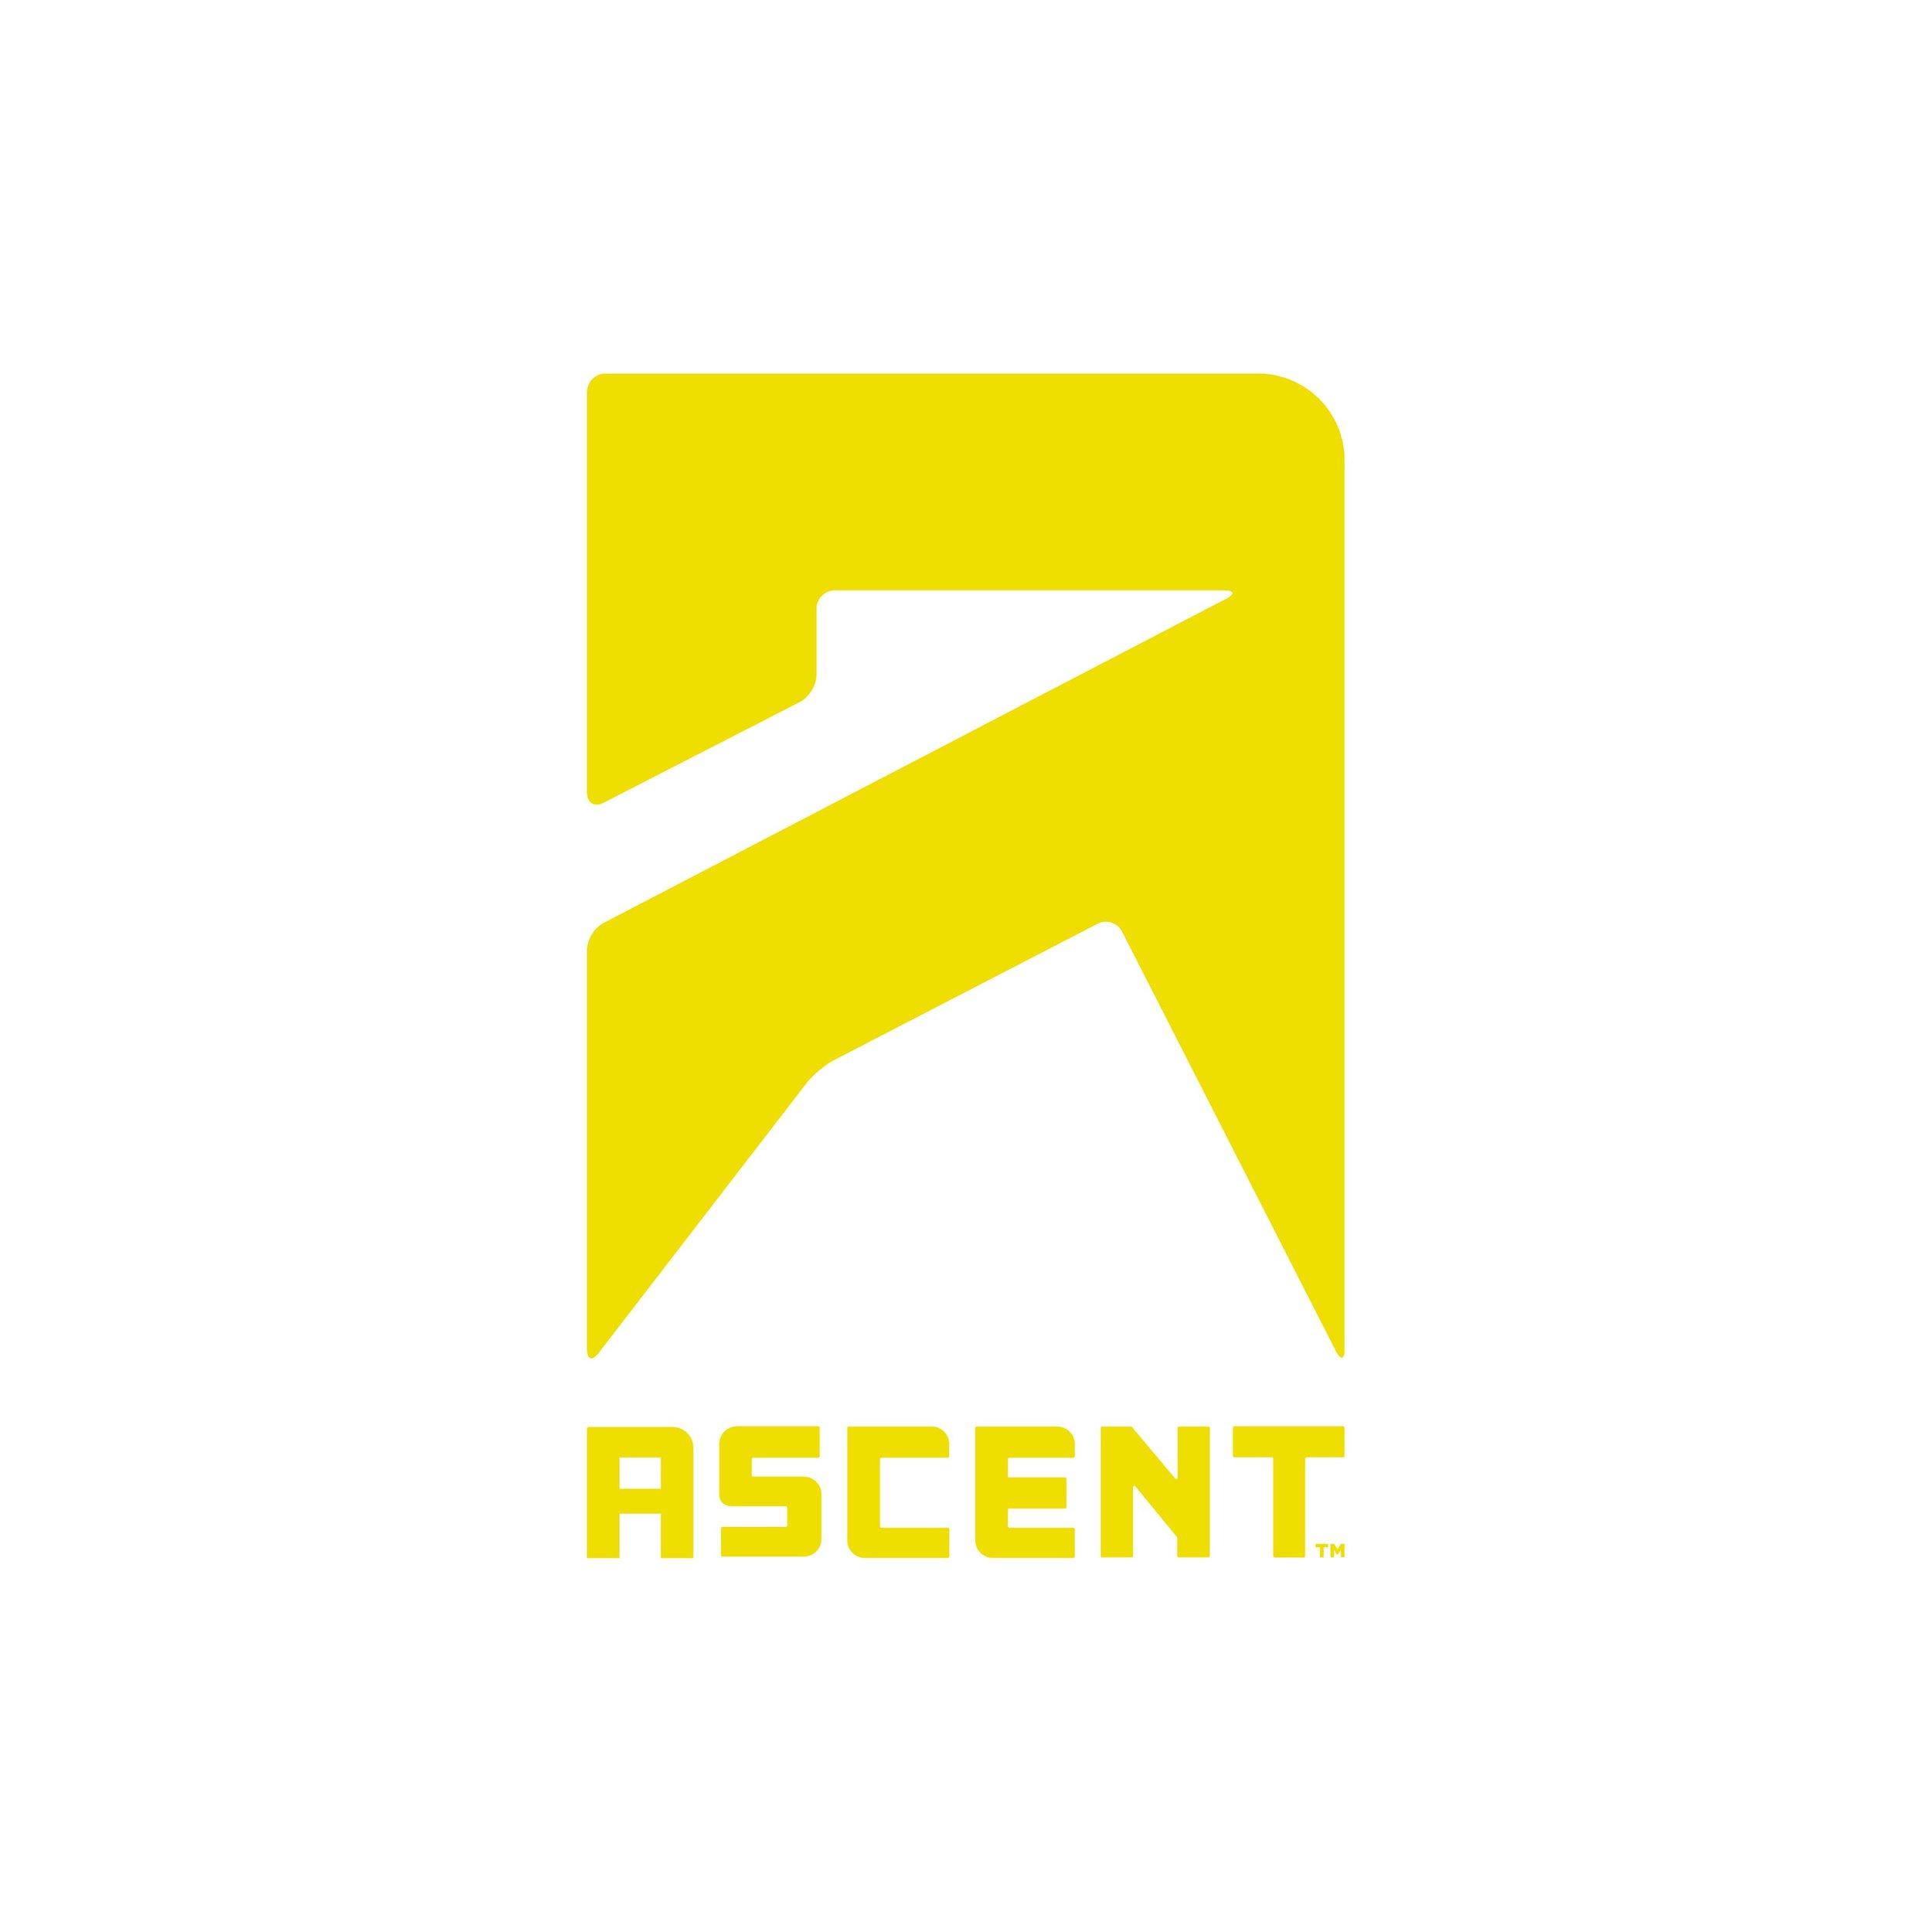 ascent-01.jpg